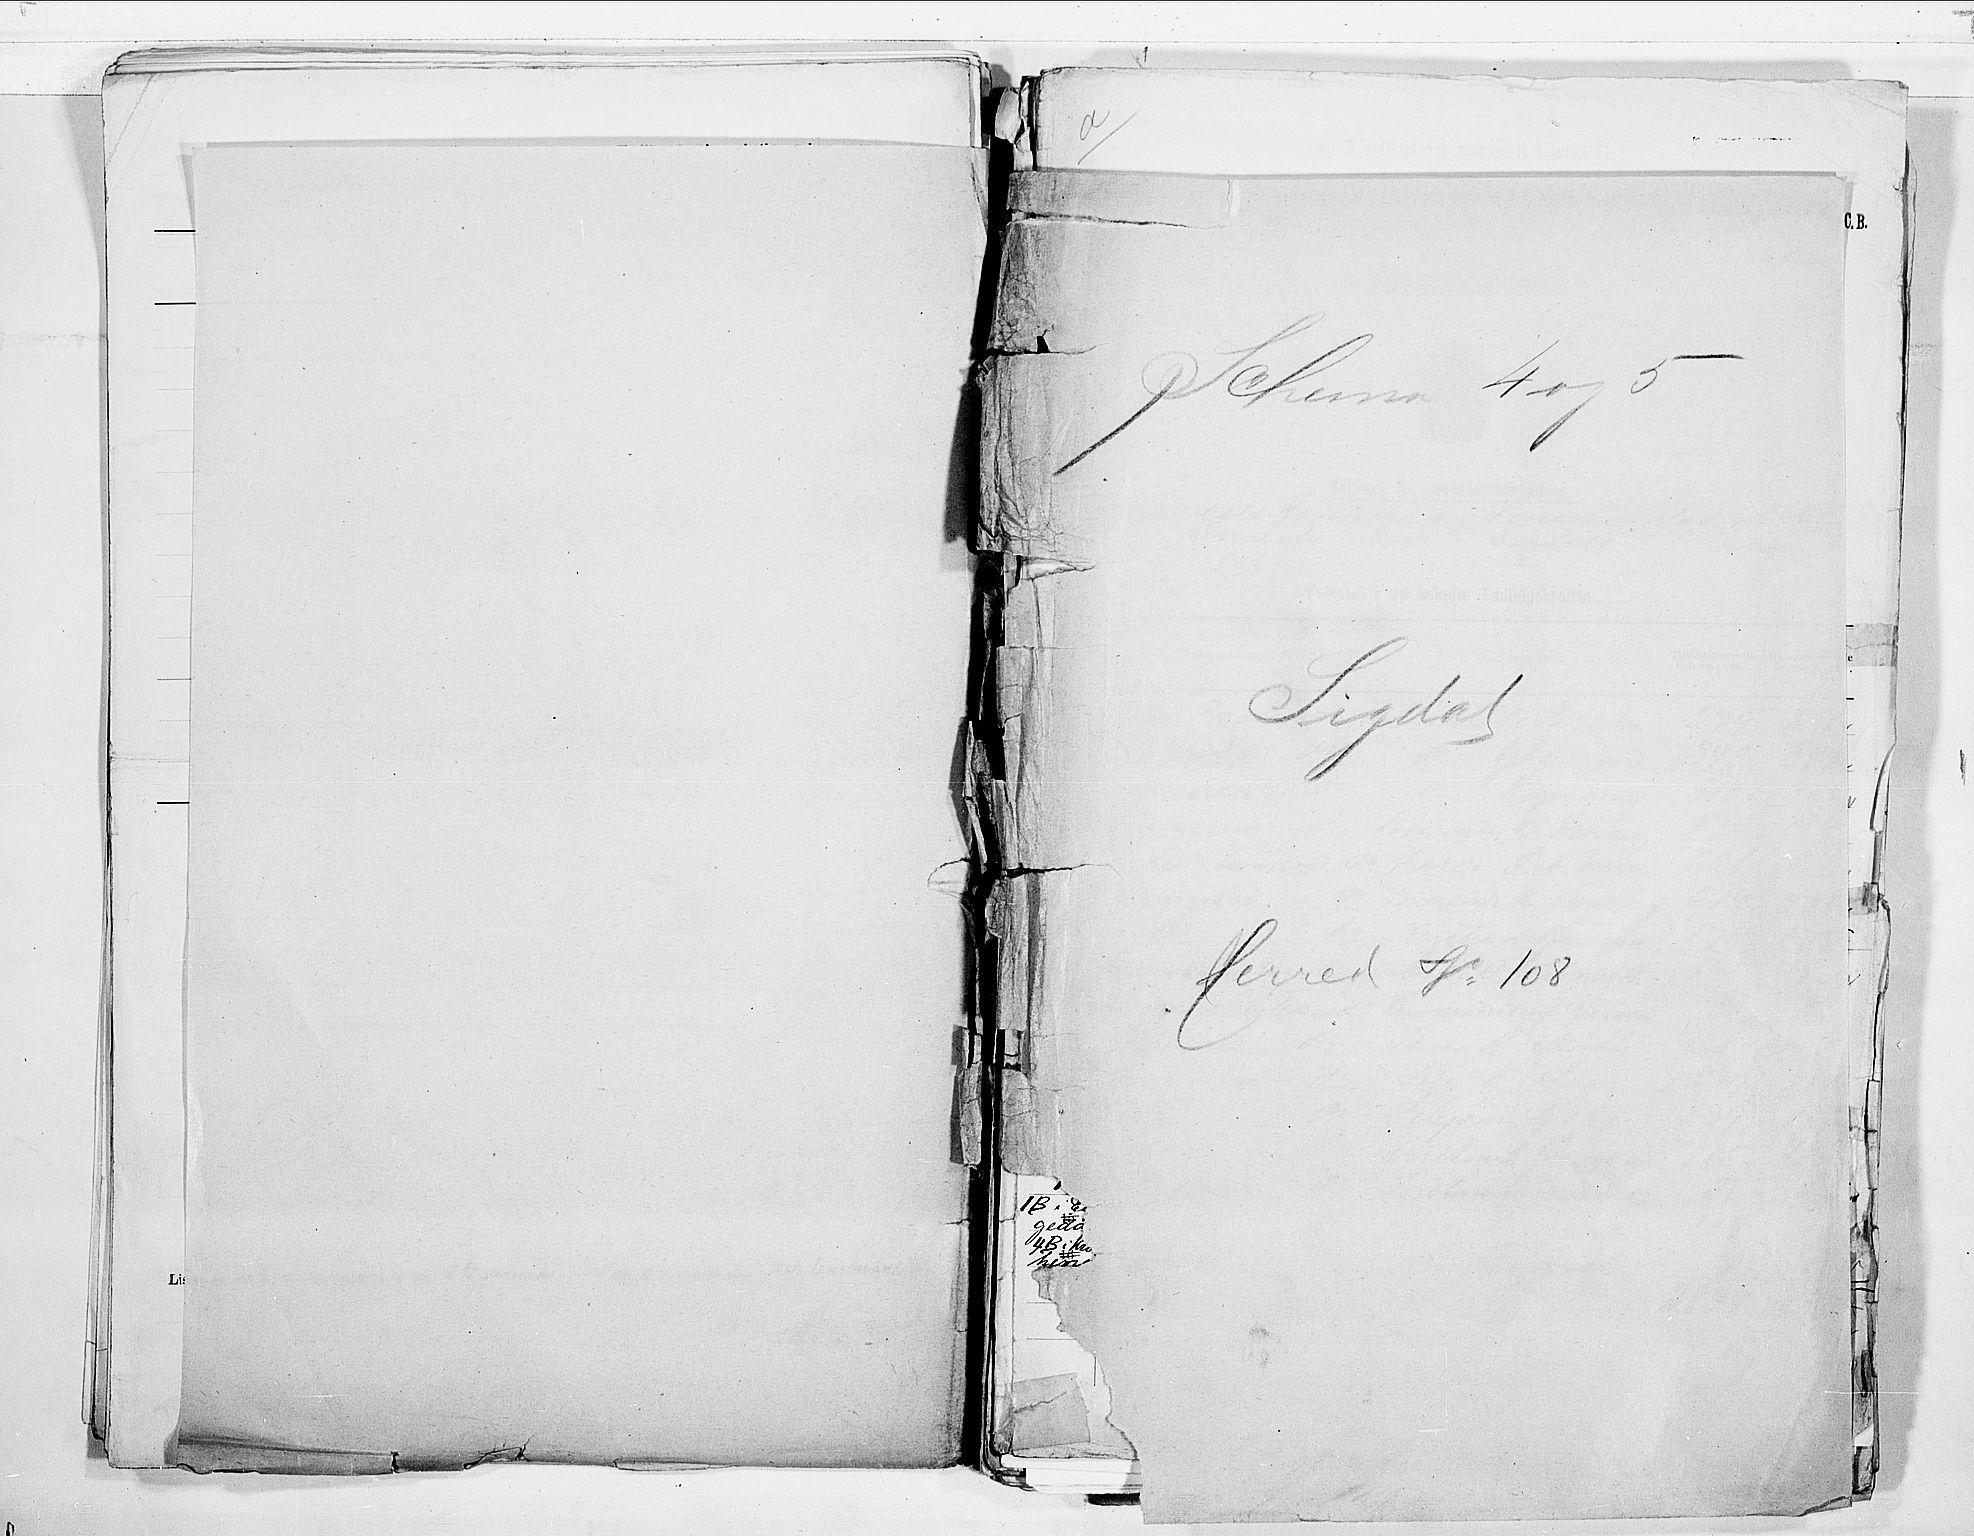 RA, Folketelling 1900 for 0621 Sigdal herred, 1900, s. 1